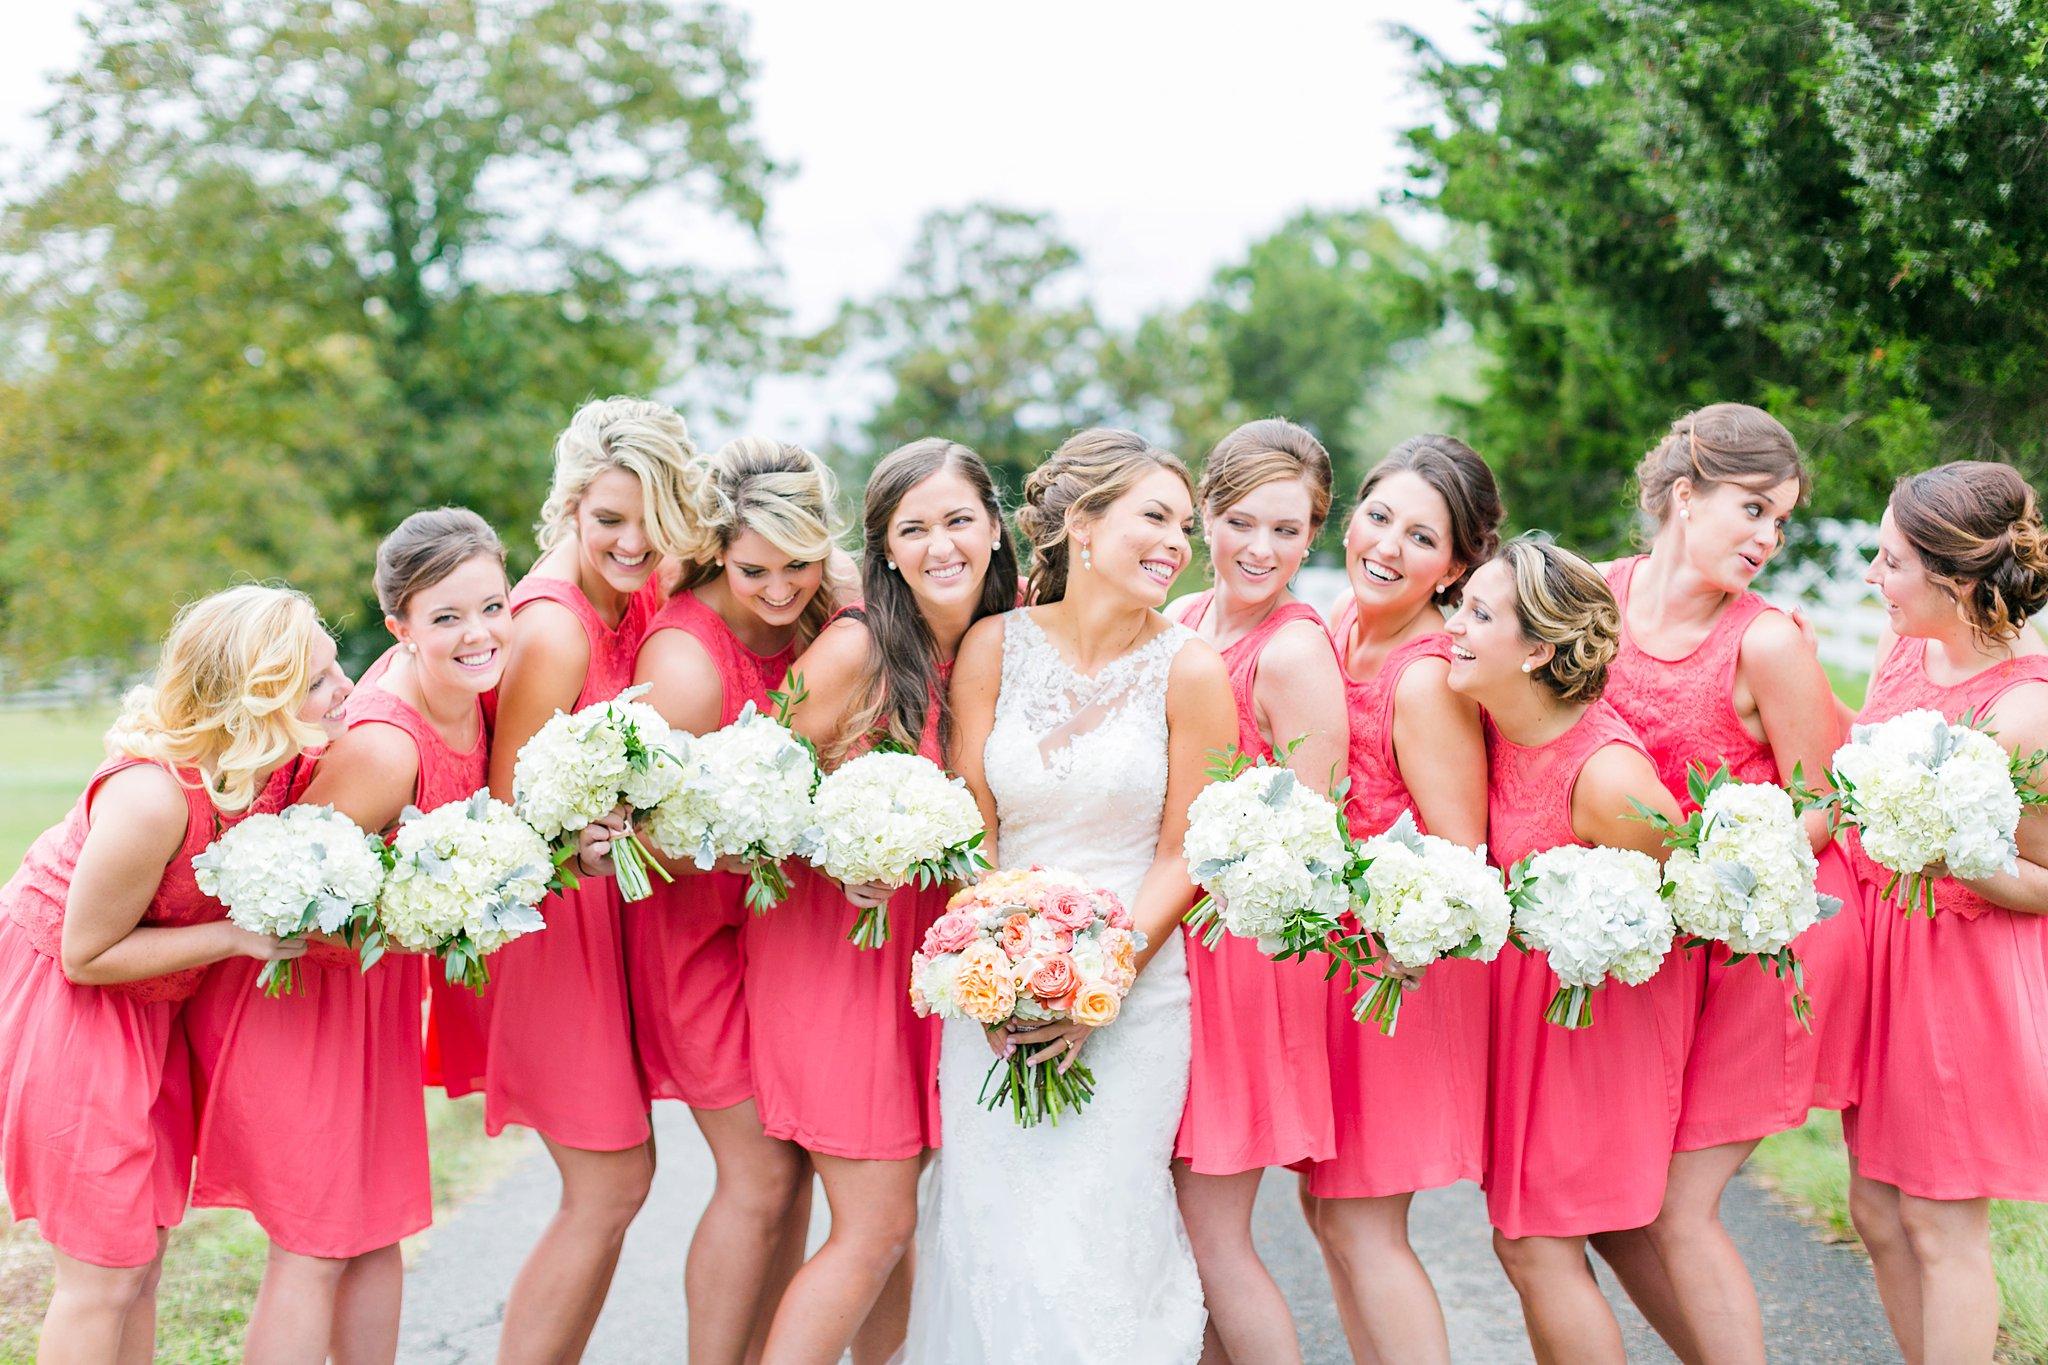 Stone Tower Winery Wedding Photos Virginia Wedding Photographer Megan Kelsey Photography Sam & Angela-62.jpg